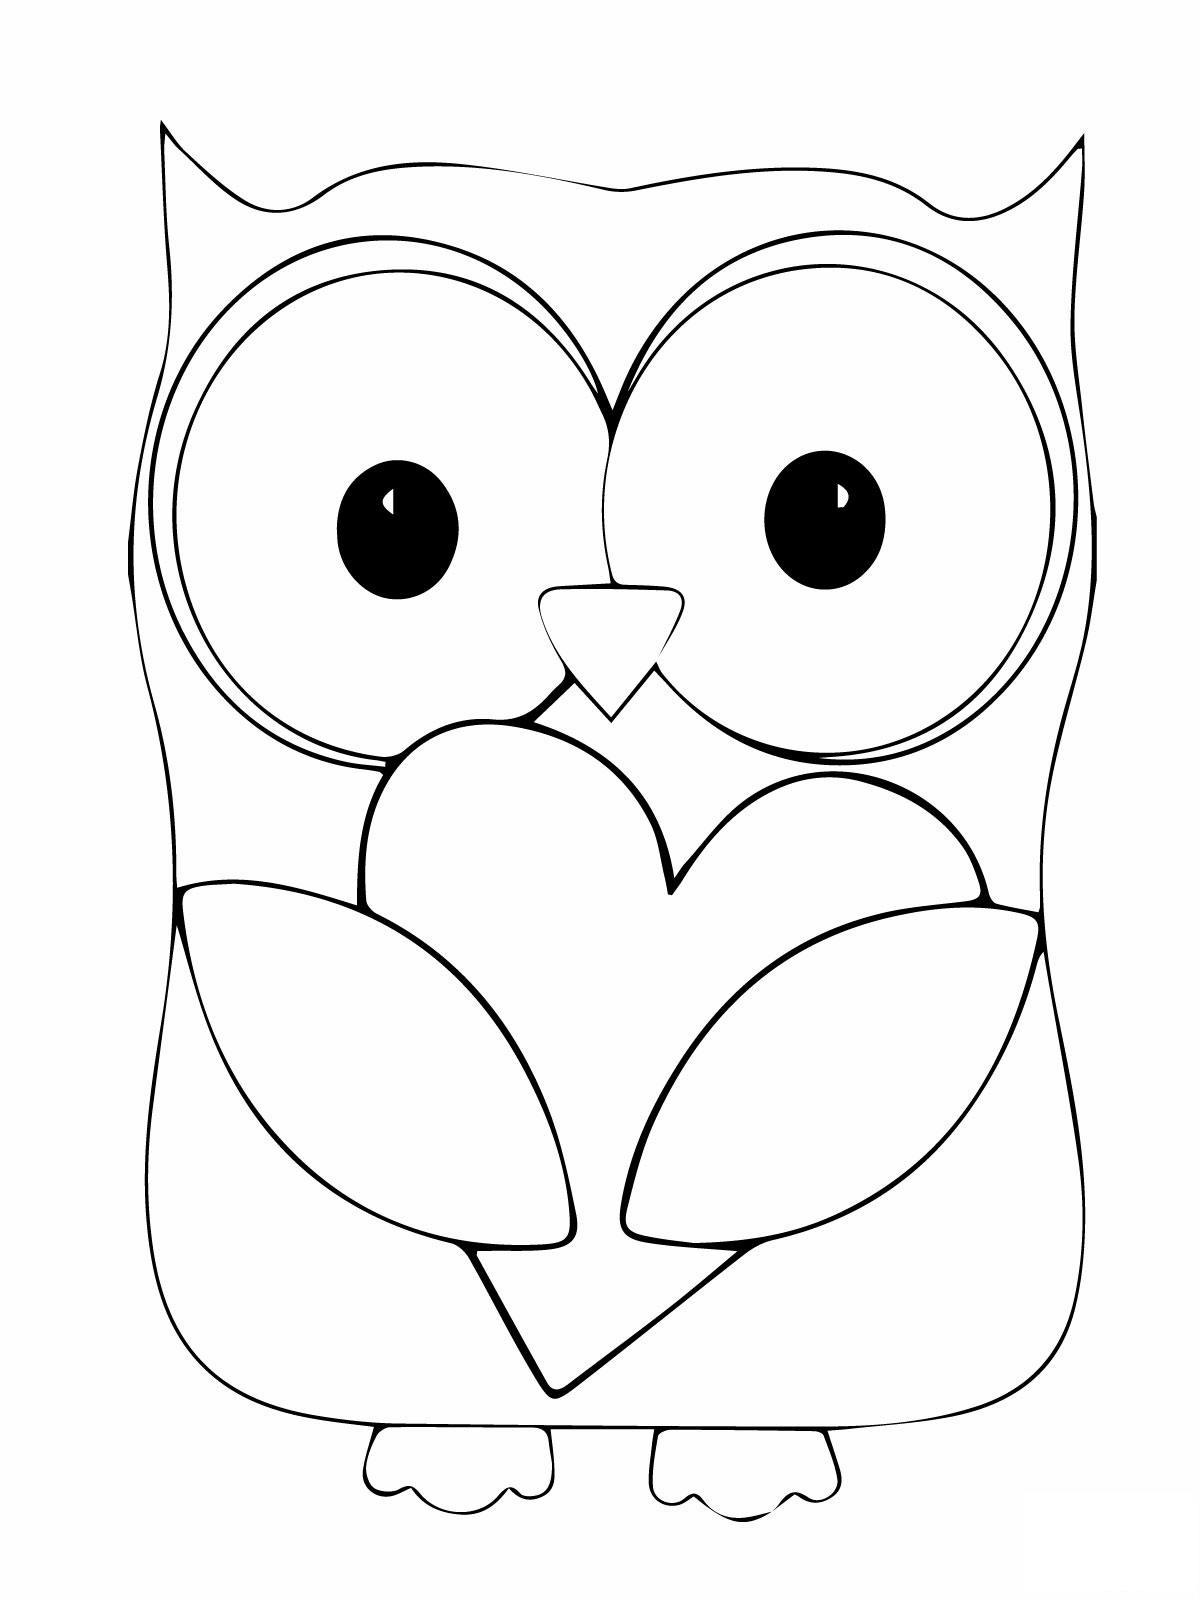 coloring pages owl owl coloring pages owl coloring pages coloring owl pages